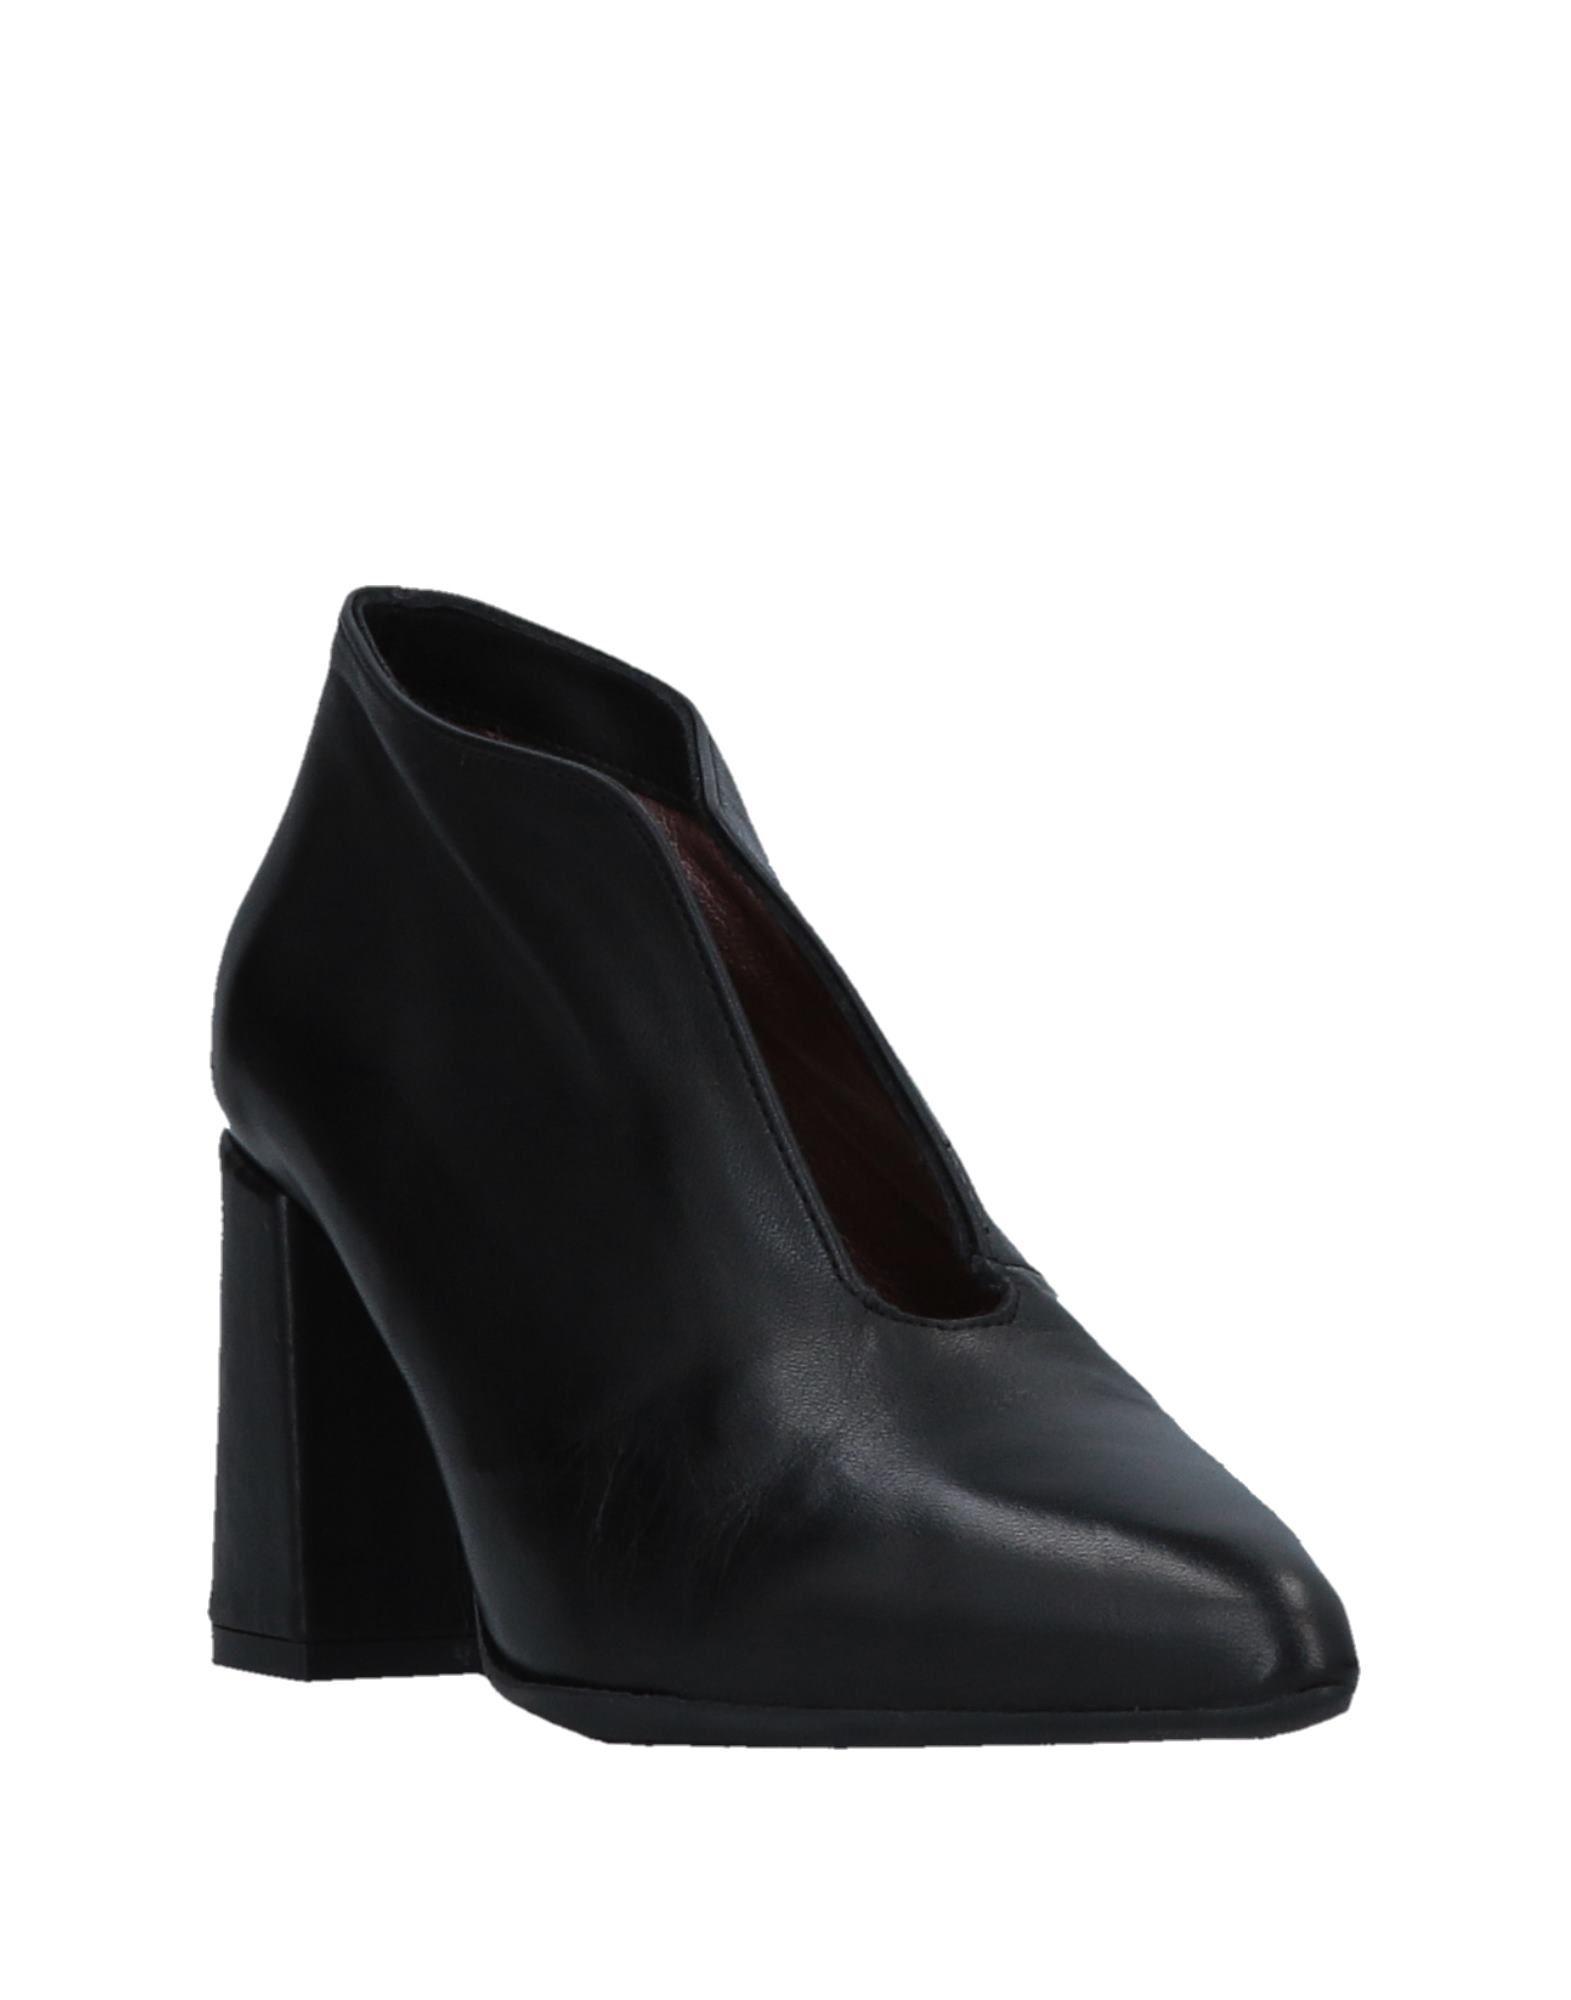 Marian Stiefelette Damen  beliebte 11511771WQ Gute Qualität beliebte  Schuhe a967bd